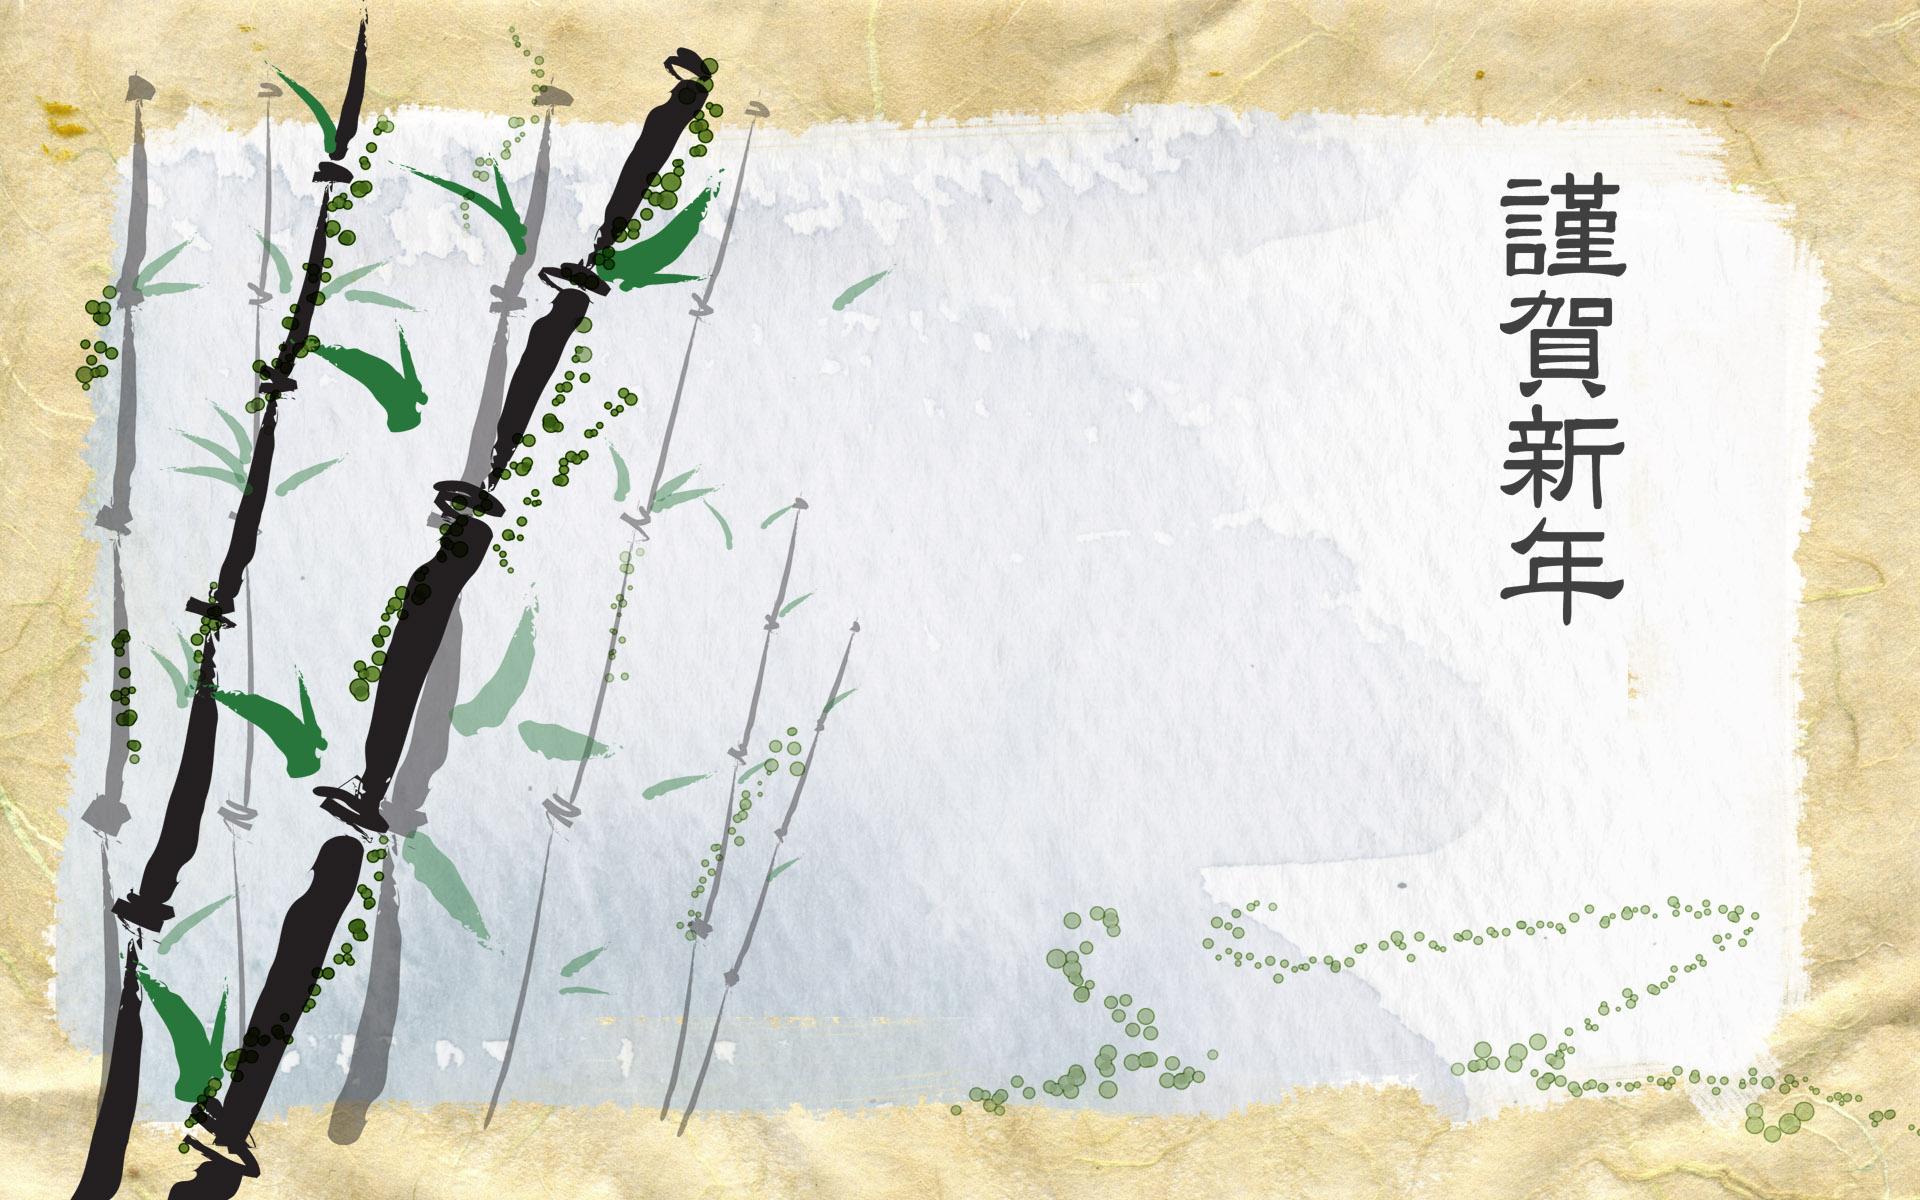 Japanese Art Wallpaper Japanese Art Wallpapers 19 Jpg 1920x1200